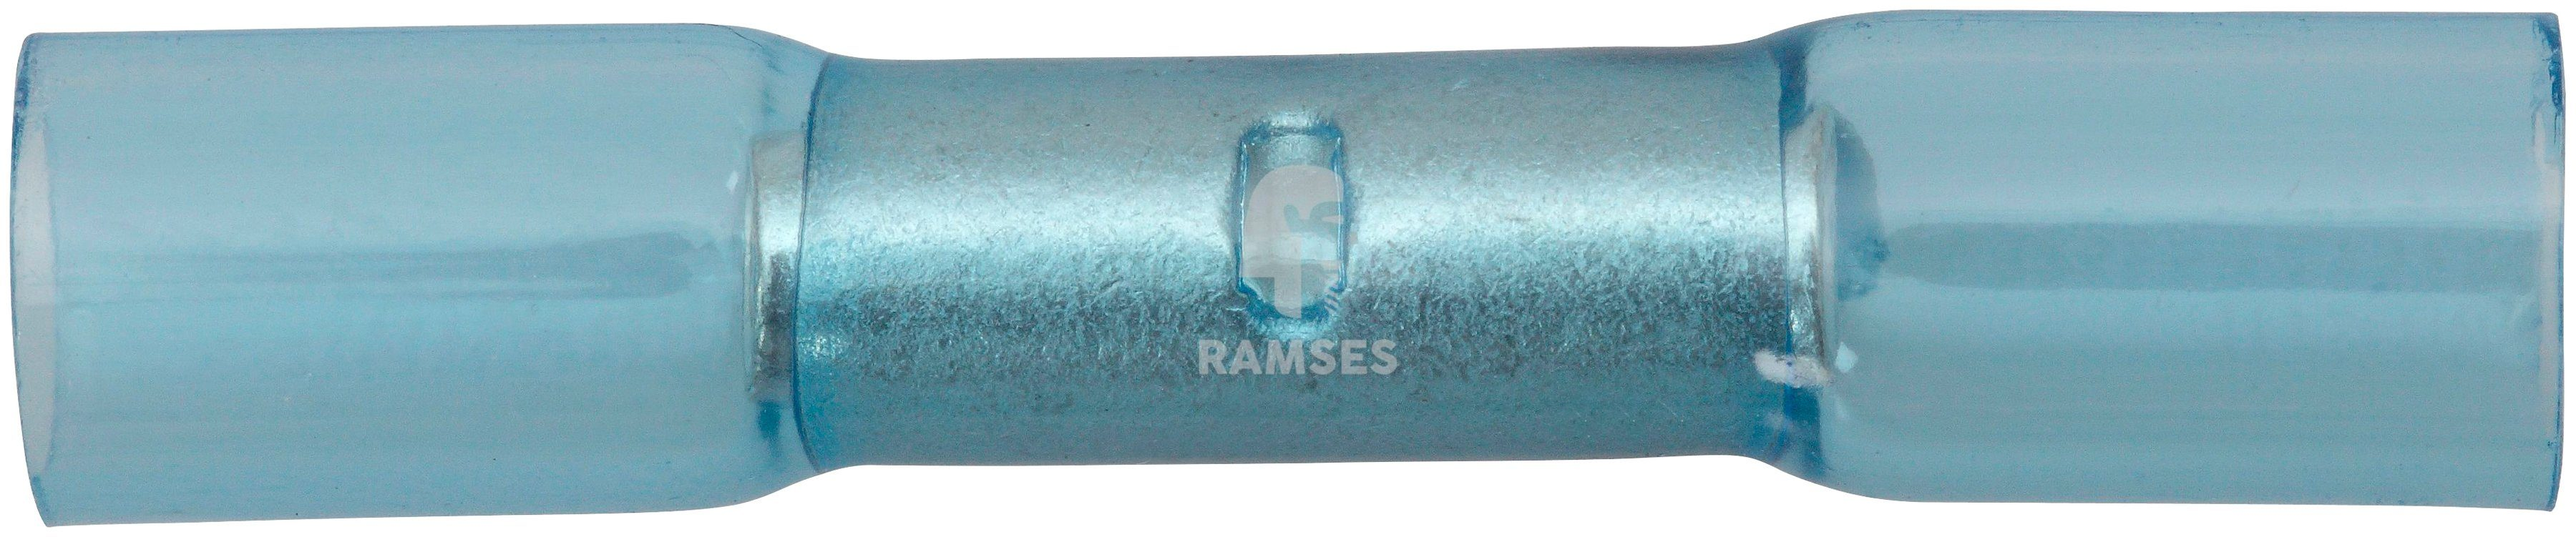 RAMSES Stoßverbinder , blau 1,5 - 2,5 mm² Polyolefin 50 Stück